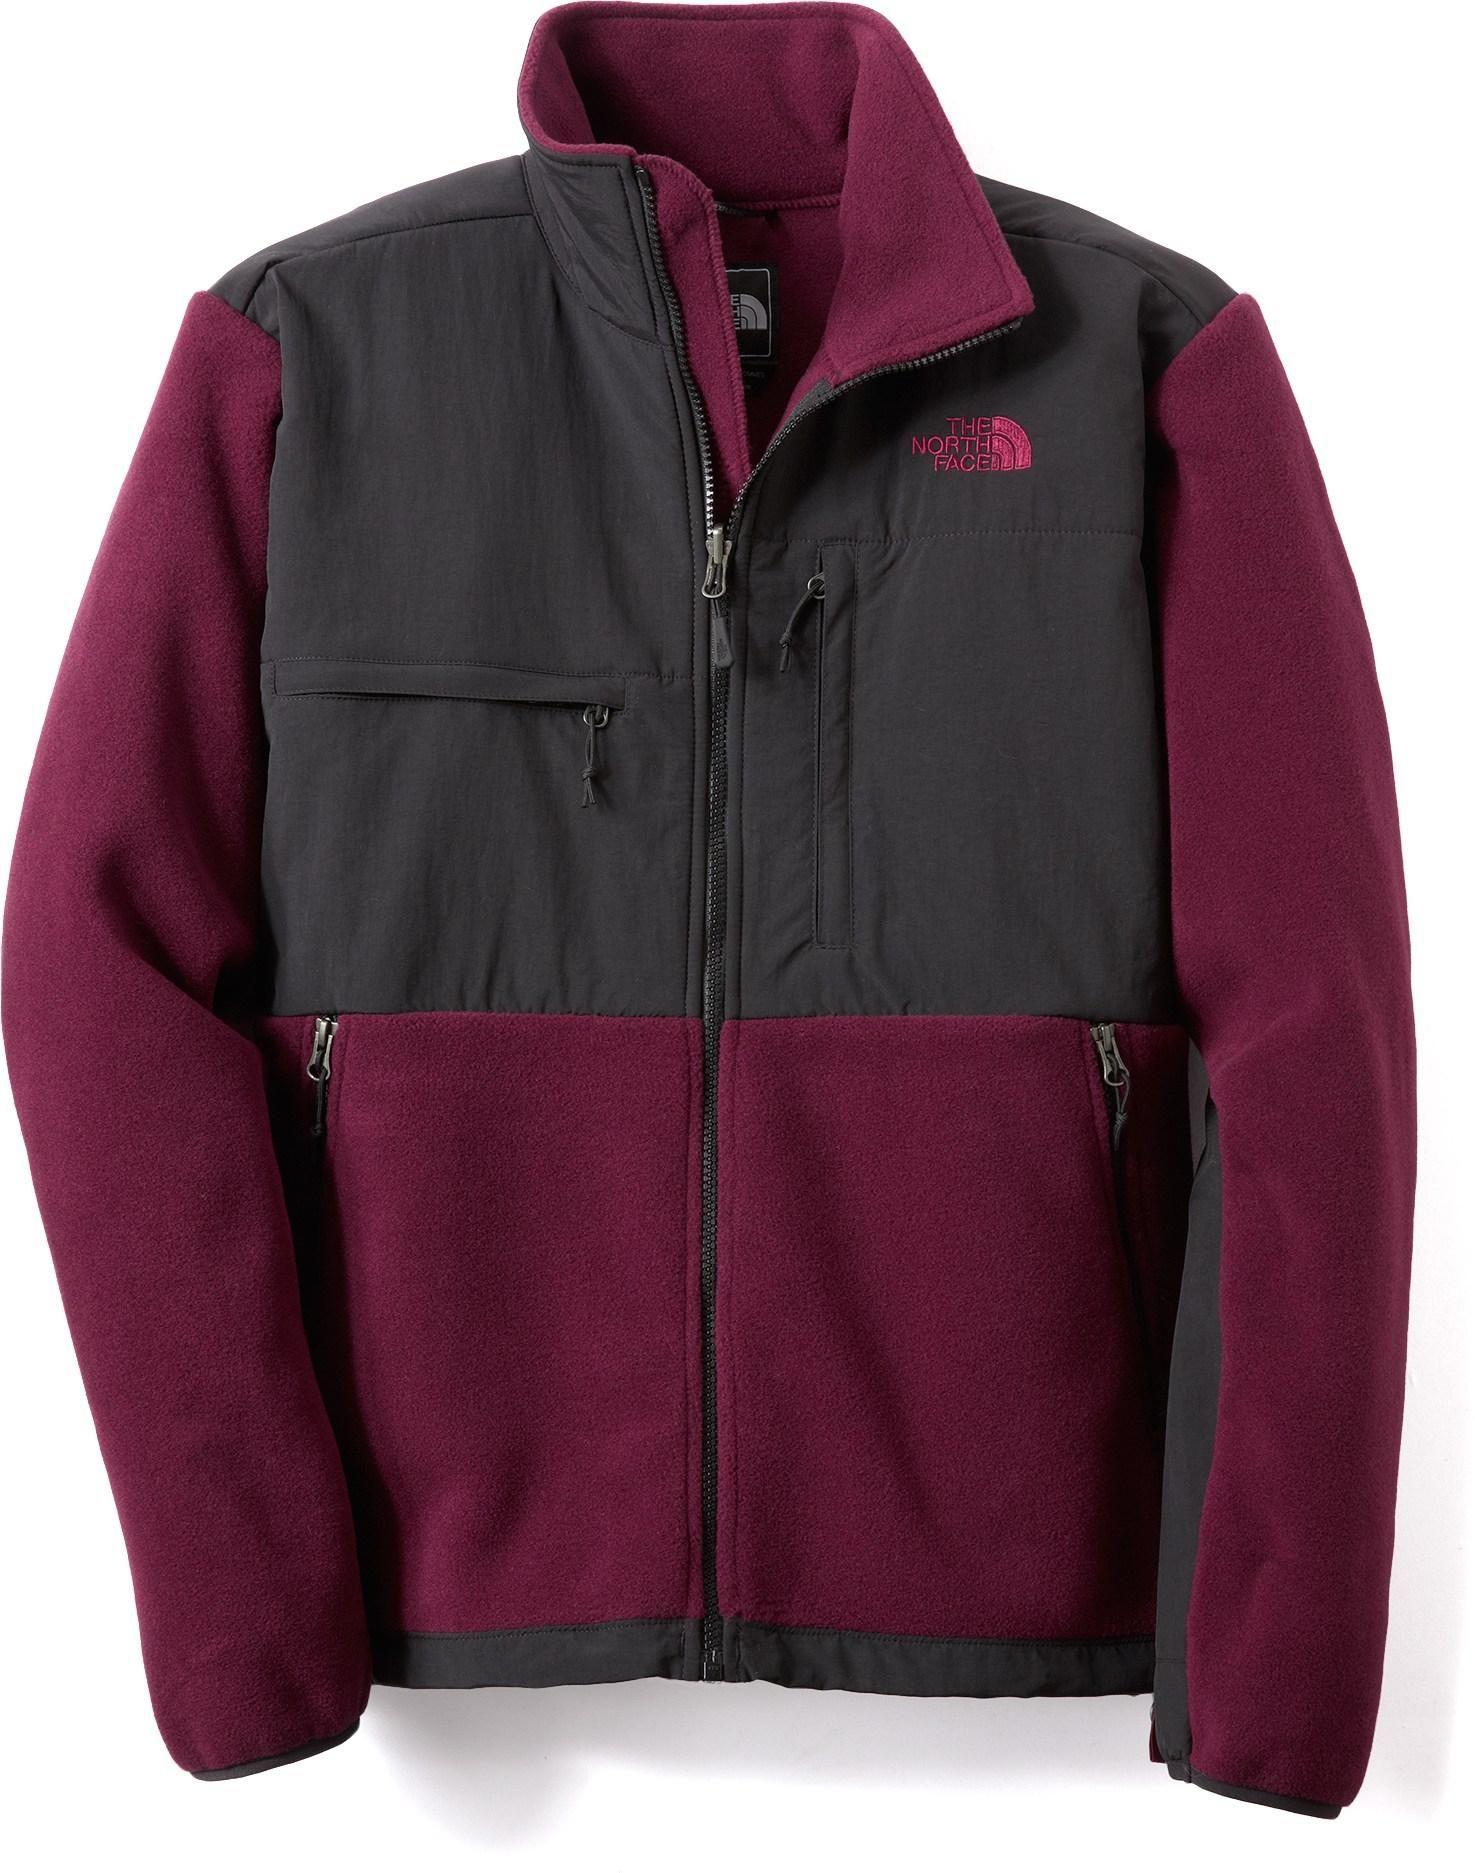 The North Face Denali Fleece Jacket Men S 2013 Closeout Mens Jackets North Face Jacket The North Face Jackets Mens [ 1873 x 1475 Pixel ]